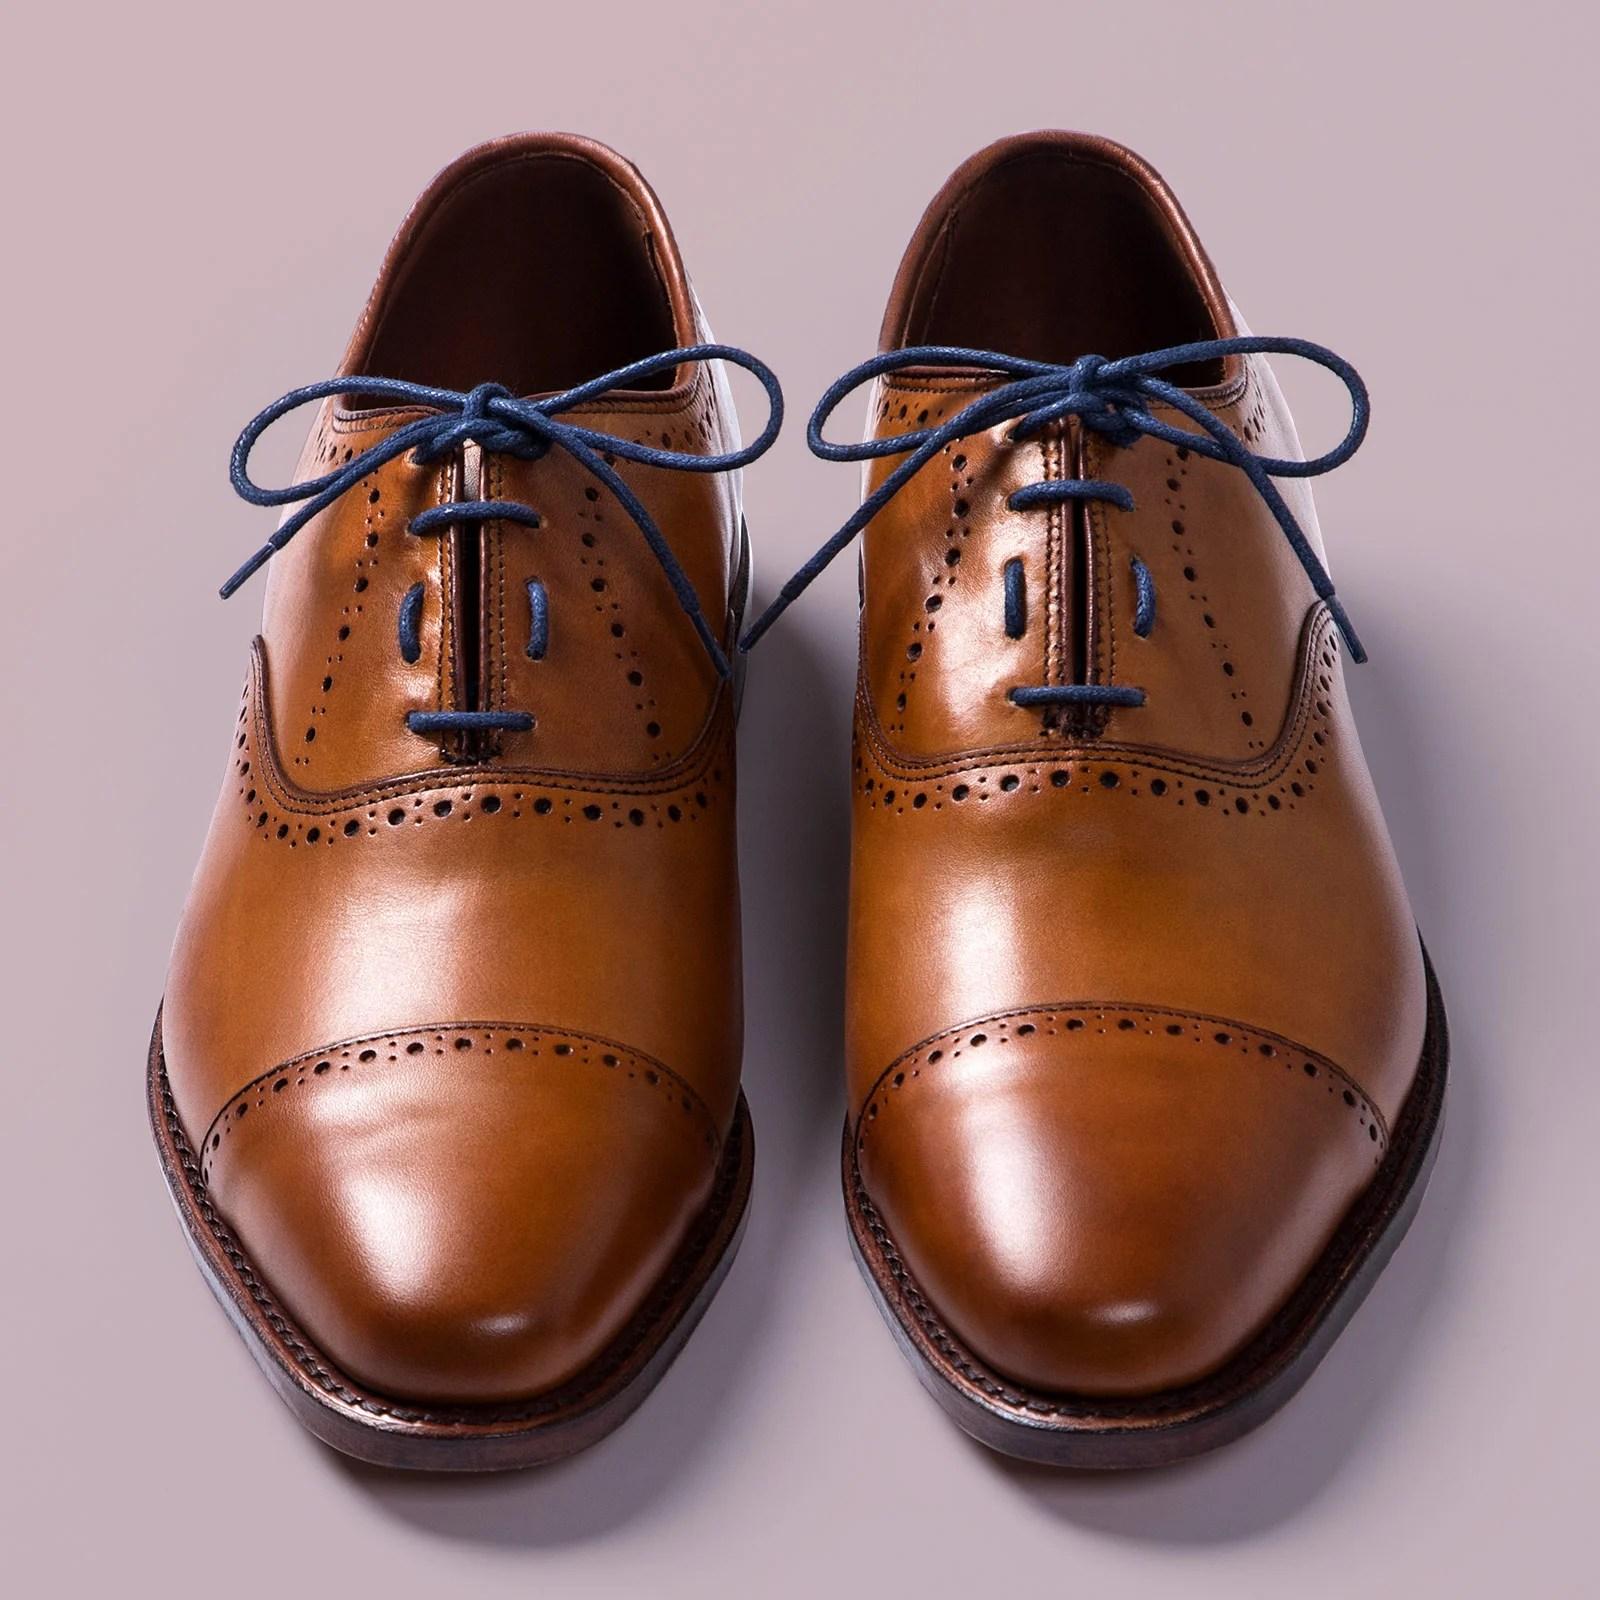 Straight Bar Shoe Lacing Tutorial